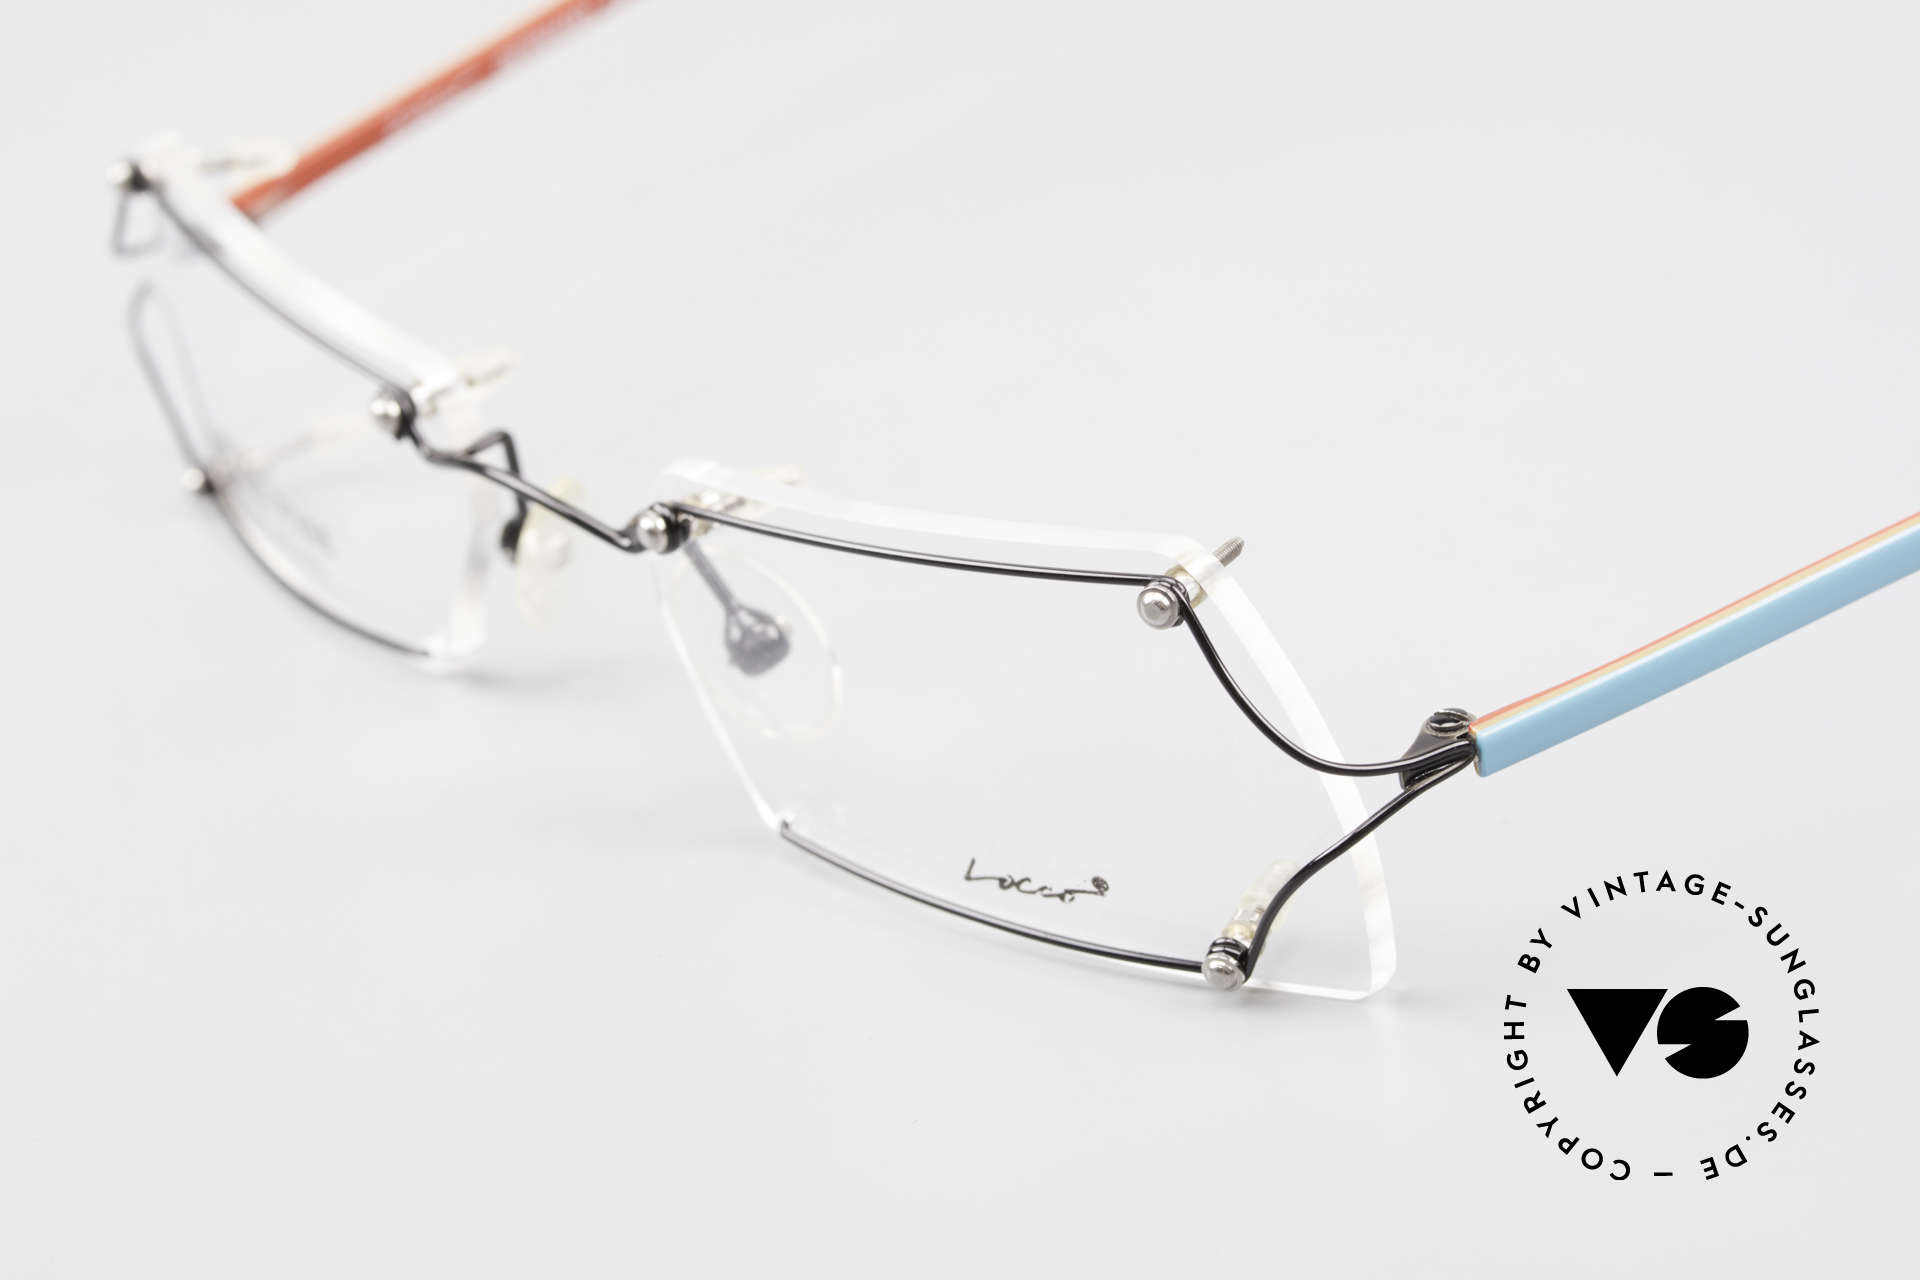 Locco Lux Crazy 90's Rimless Eyeglasses, NO RETRO eyeglasses, but an old 1990's ORIGINAL, Made for Men and Women